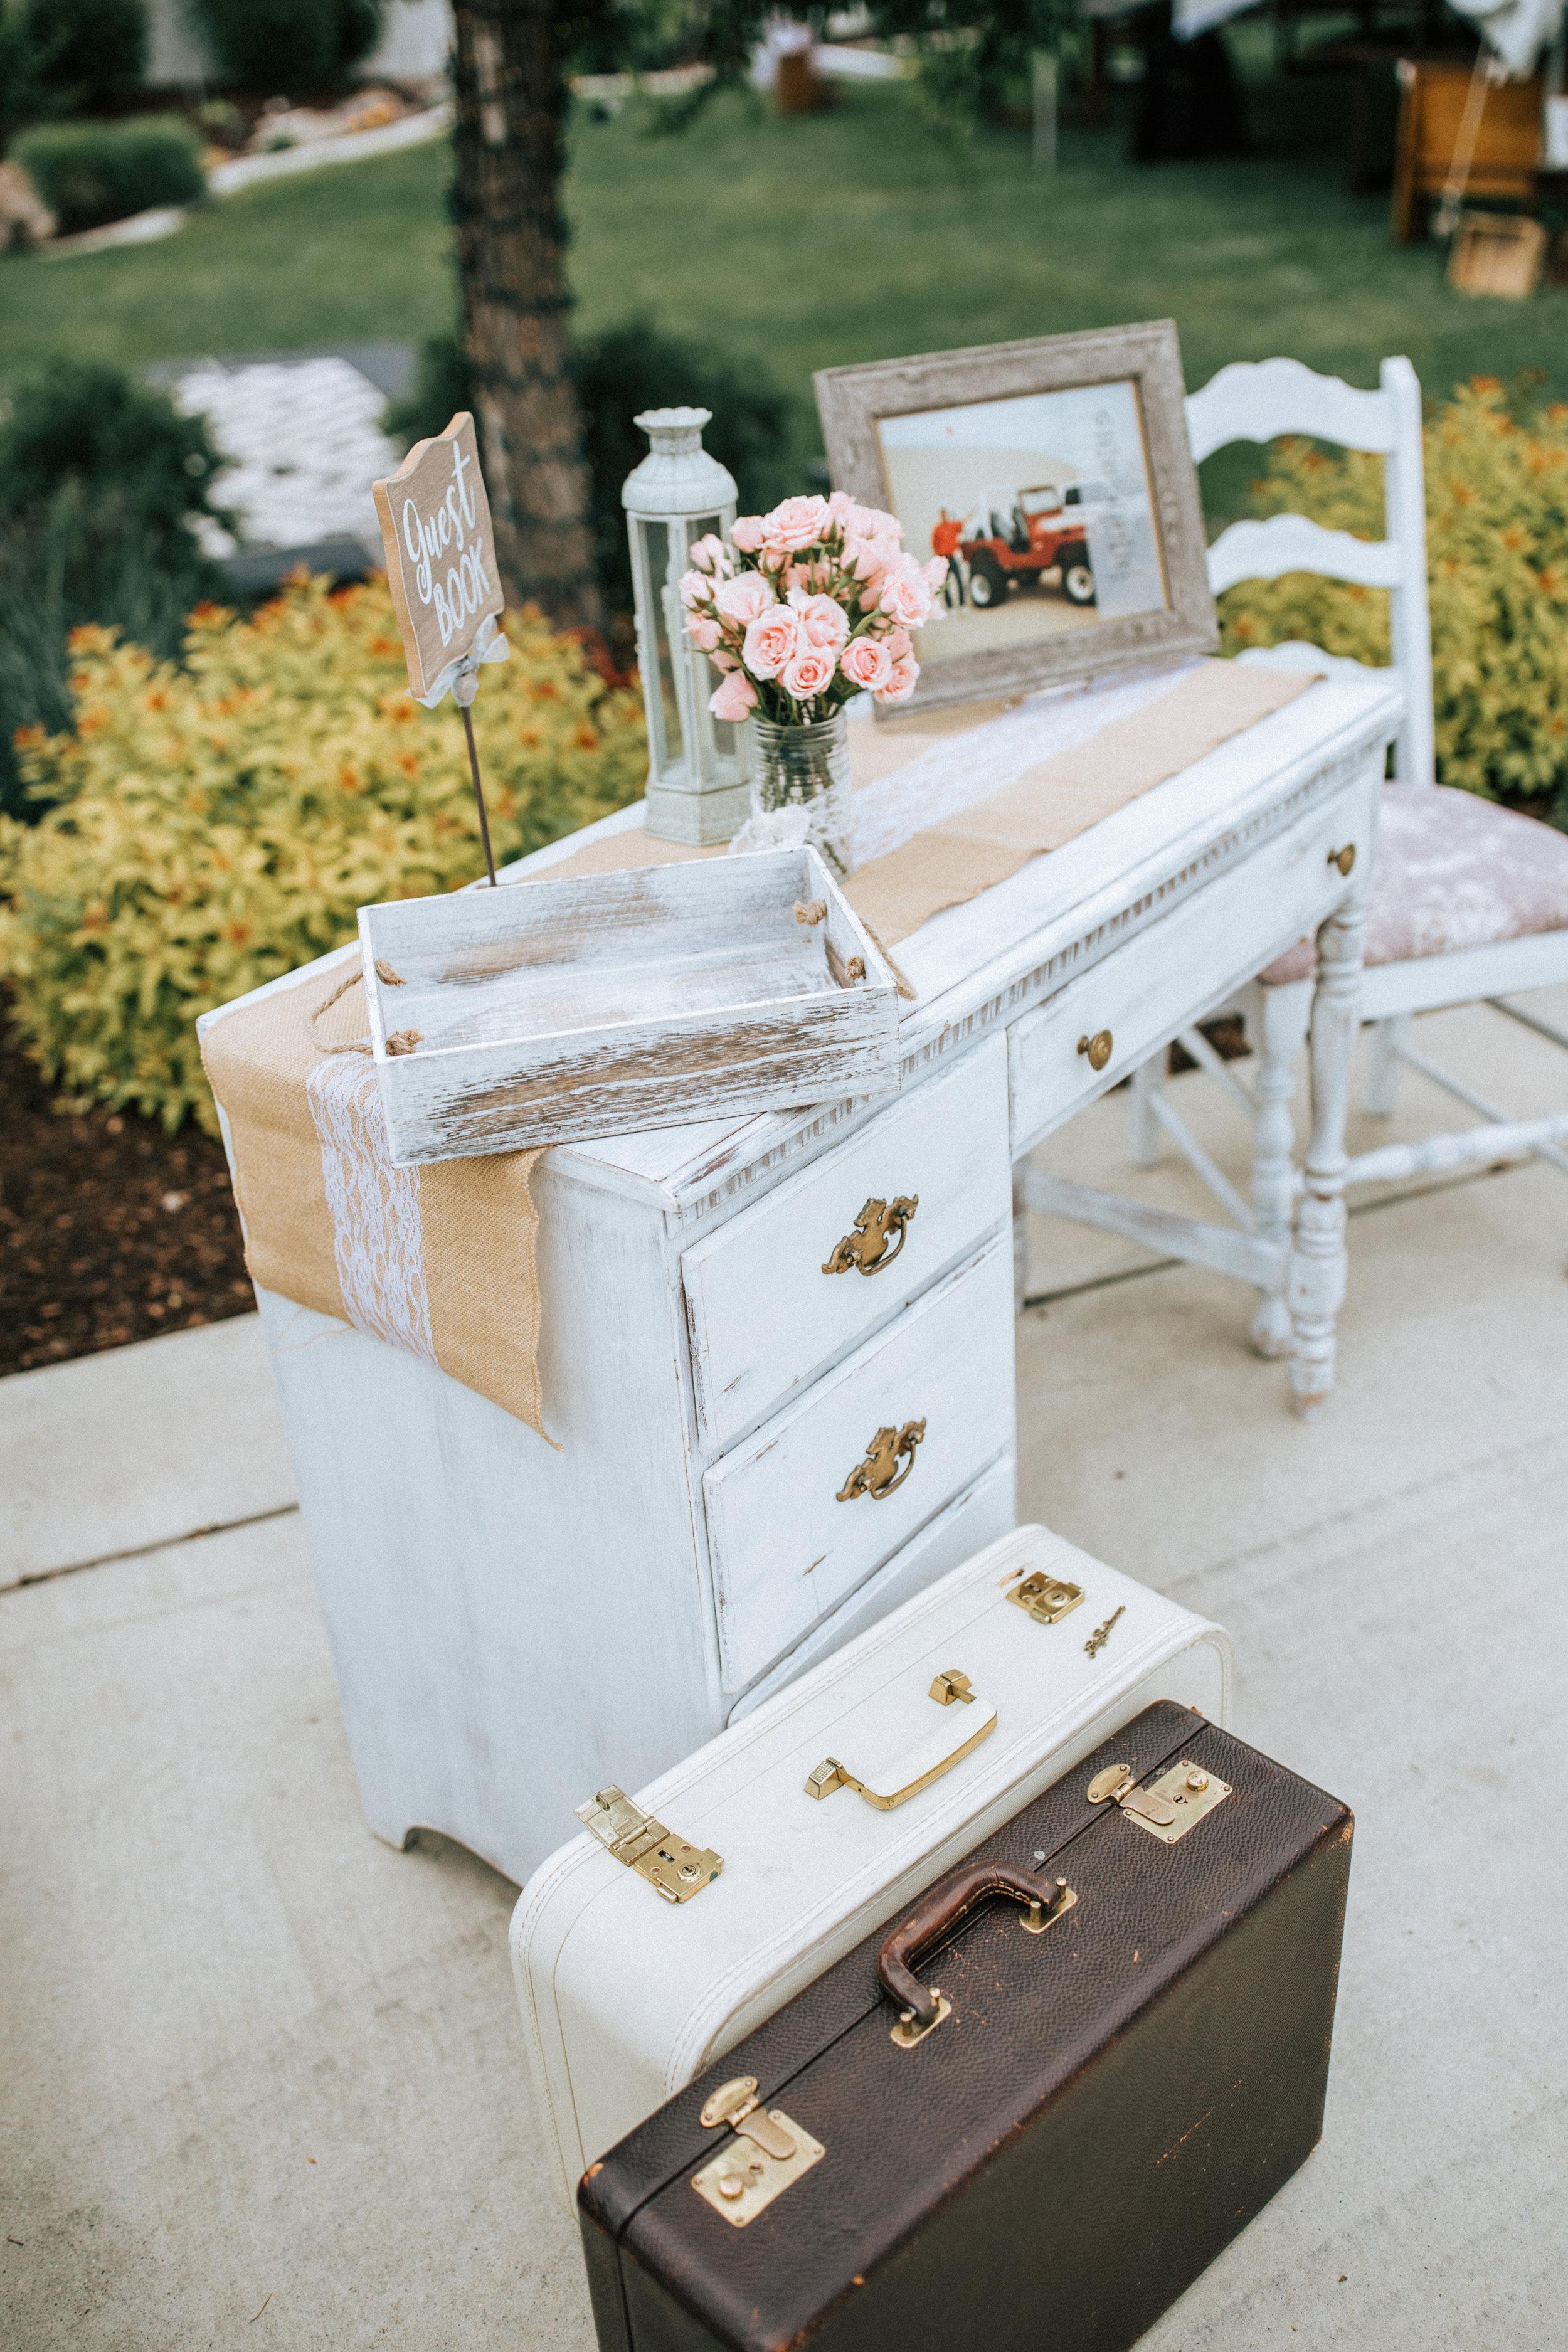 Utah backyard wedding decorations guest sign in